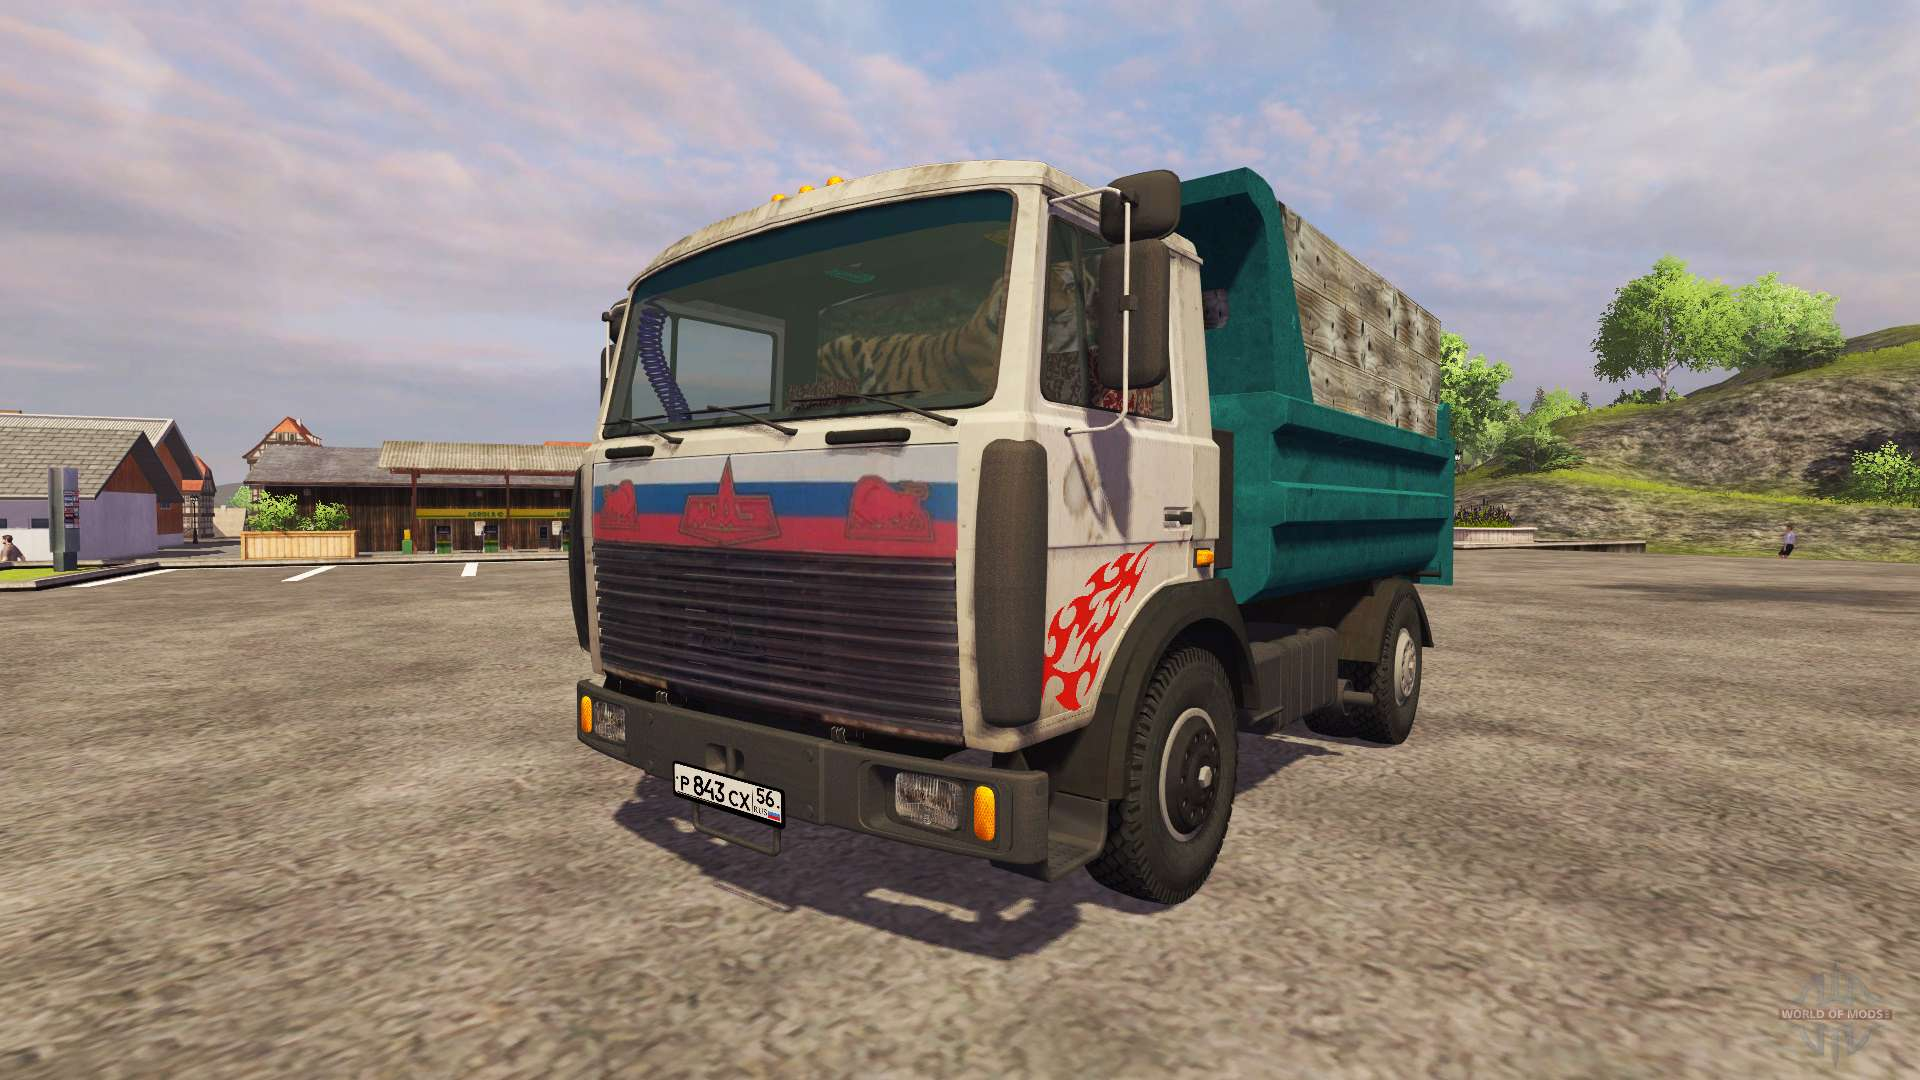 how to change brake pads on vx wagon